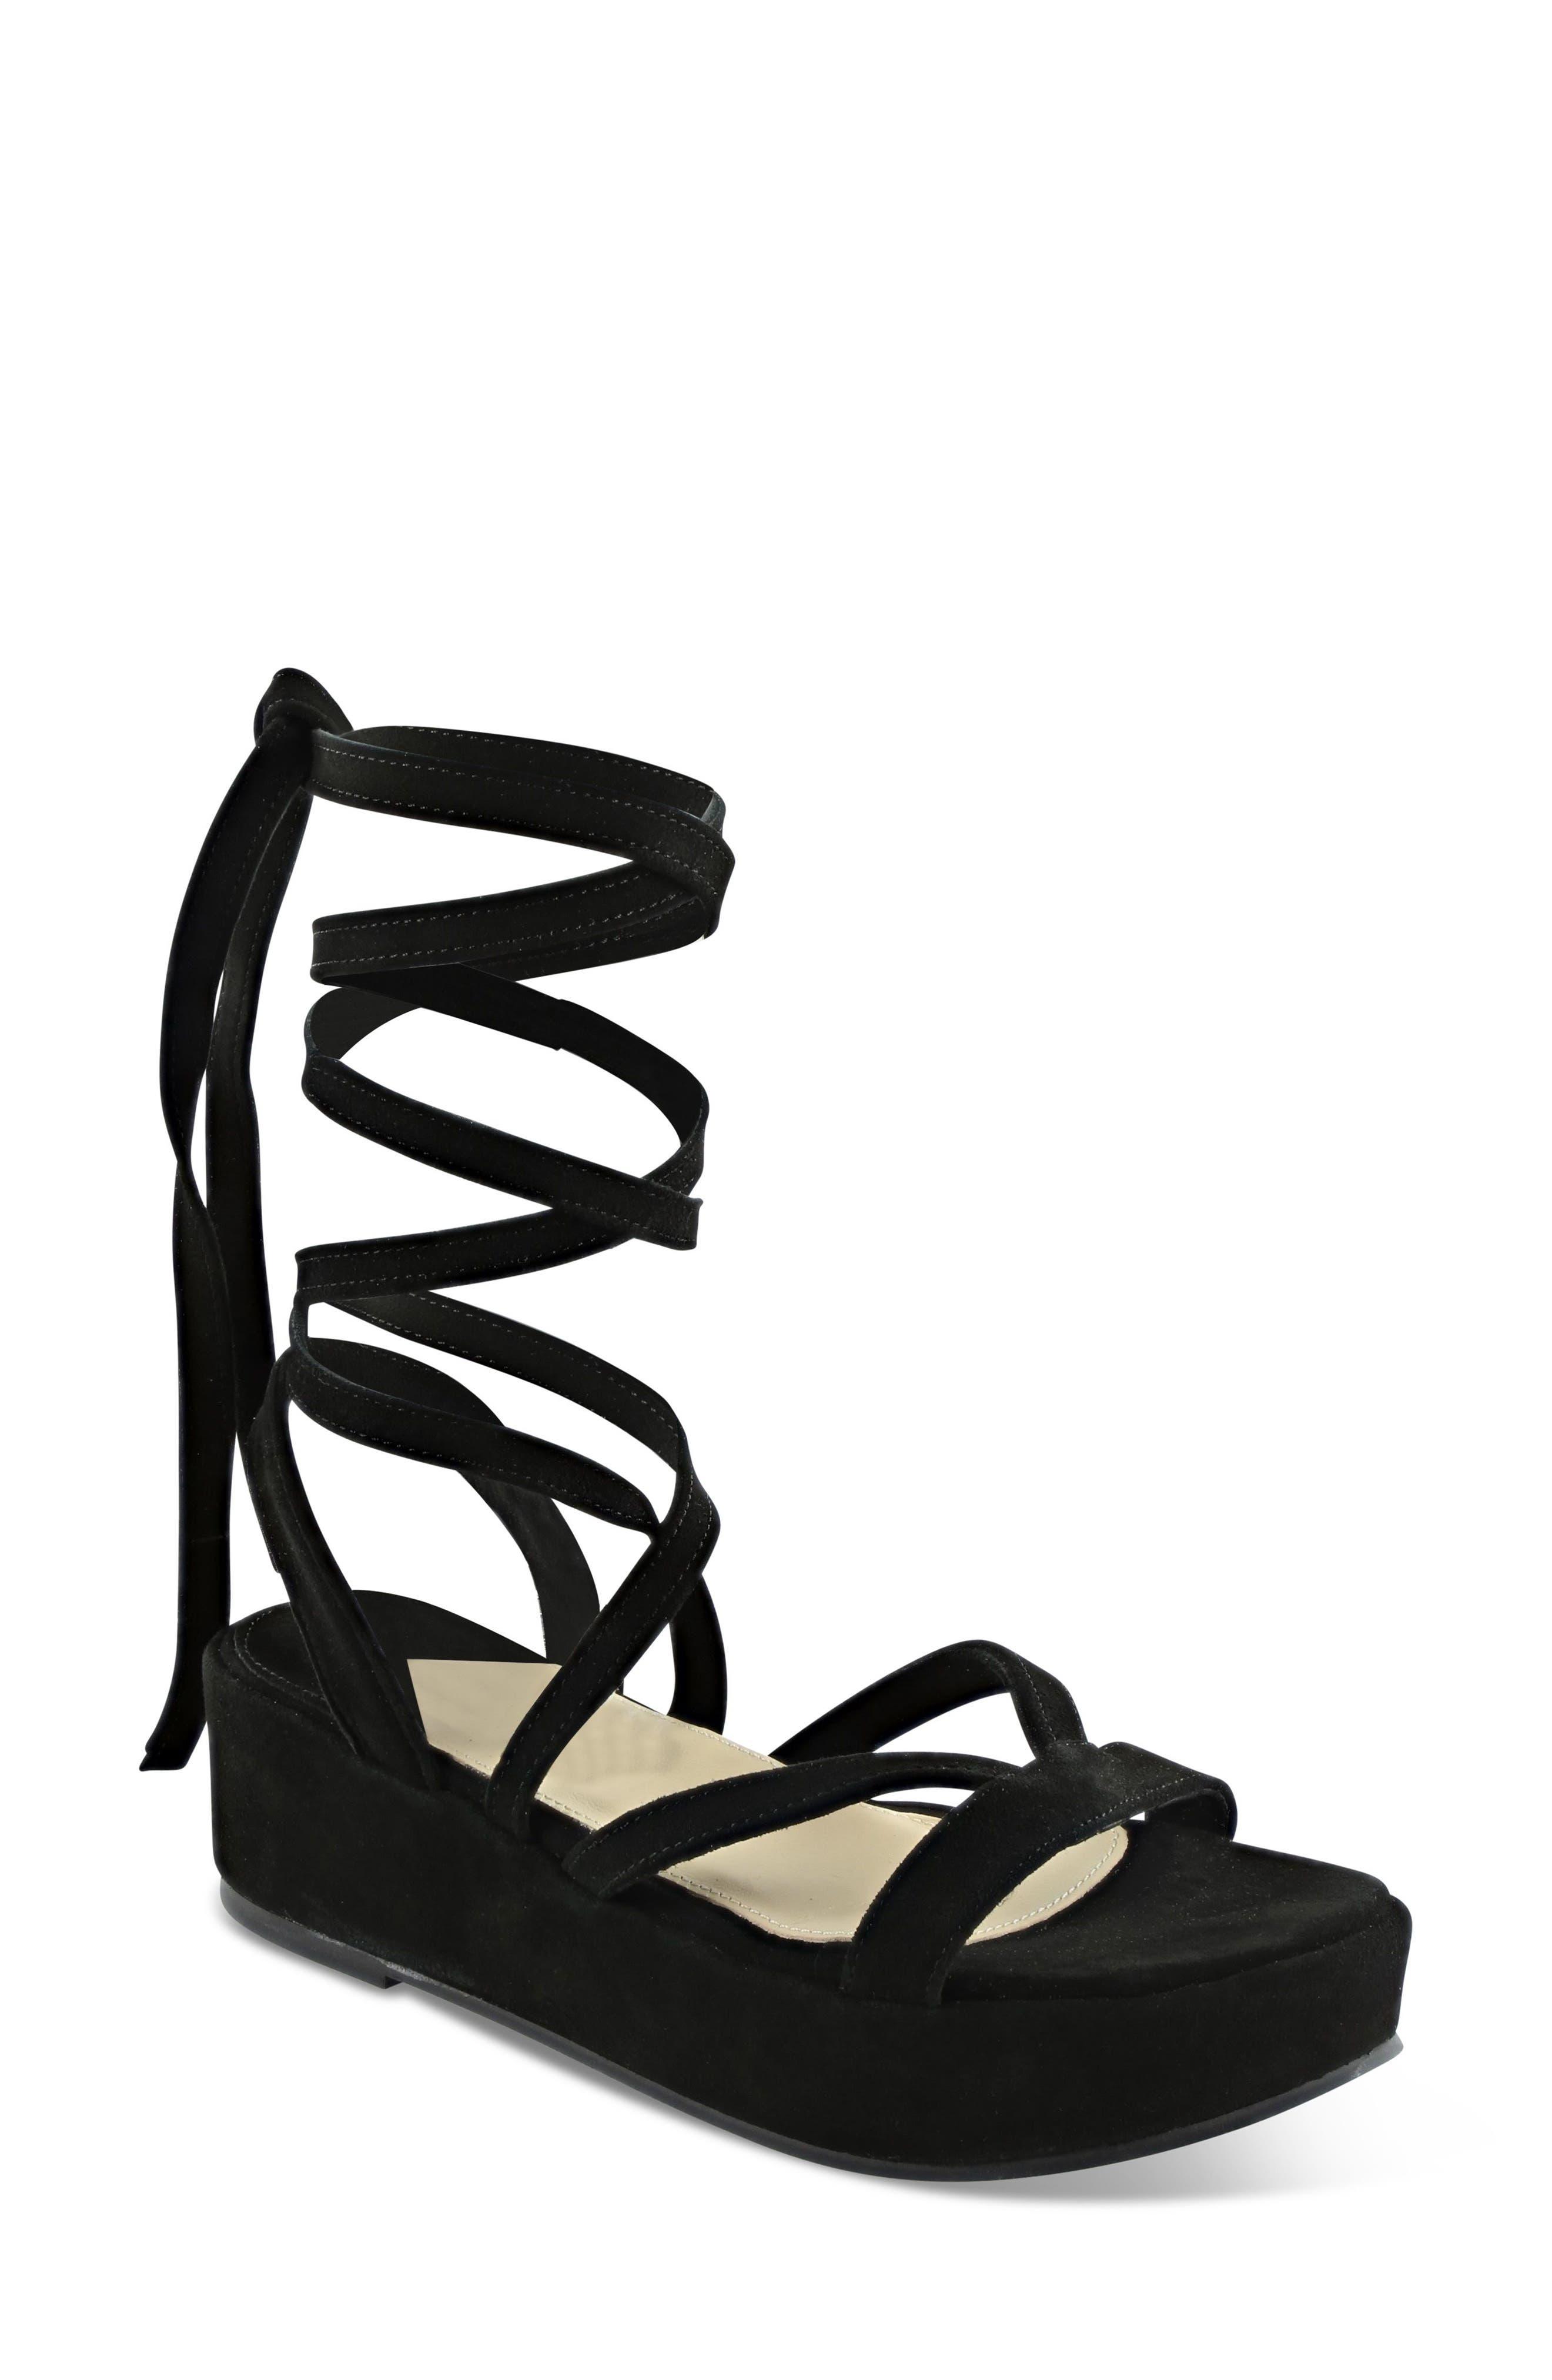 Keri Gladiator Platform Sandal,                             Main thumbnail 1, color,                             002